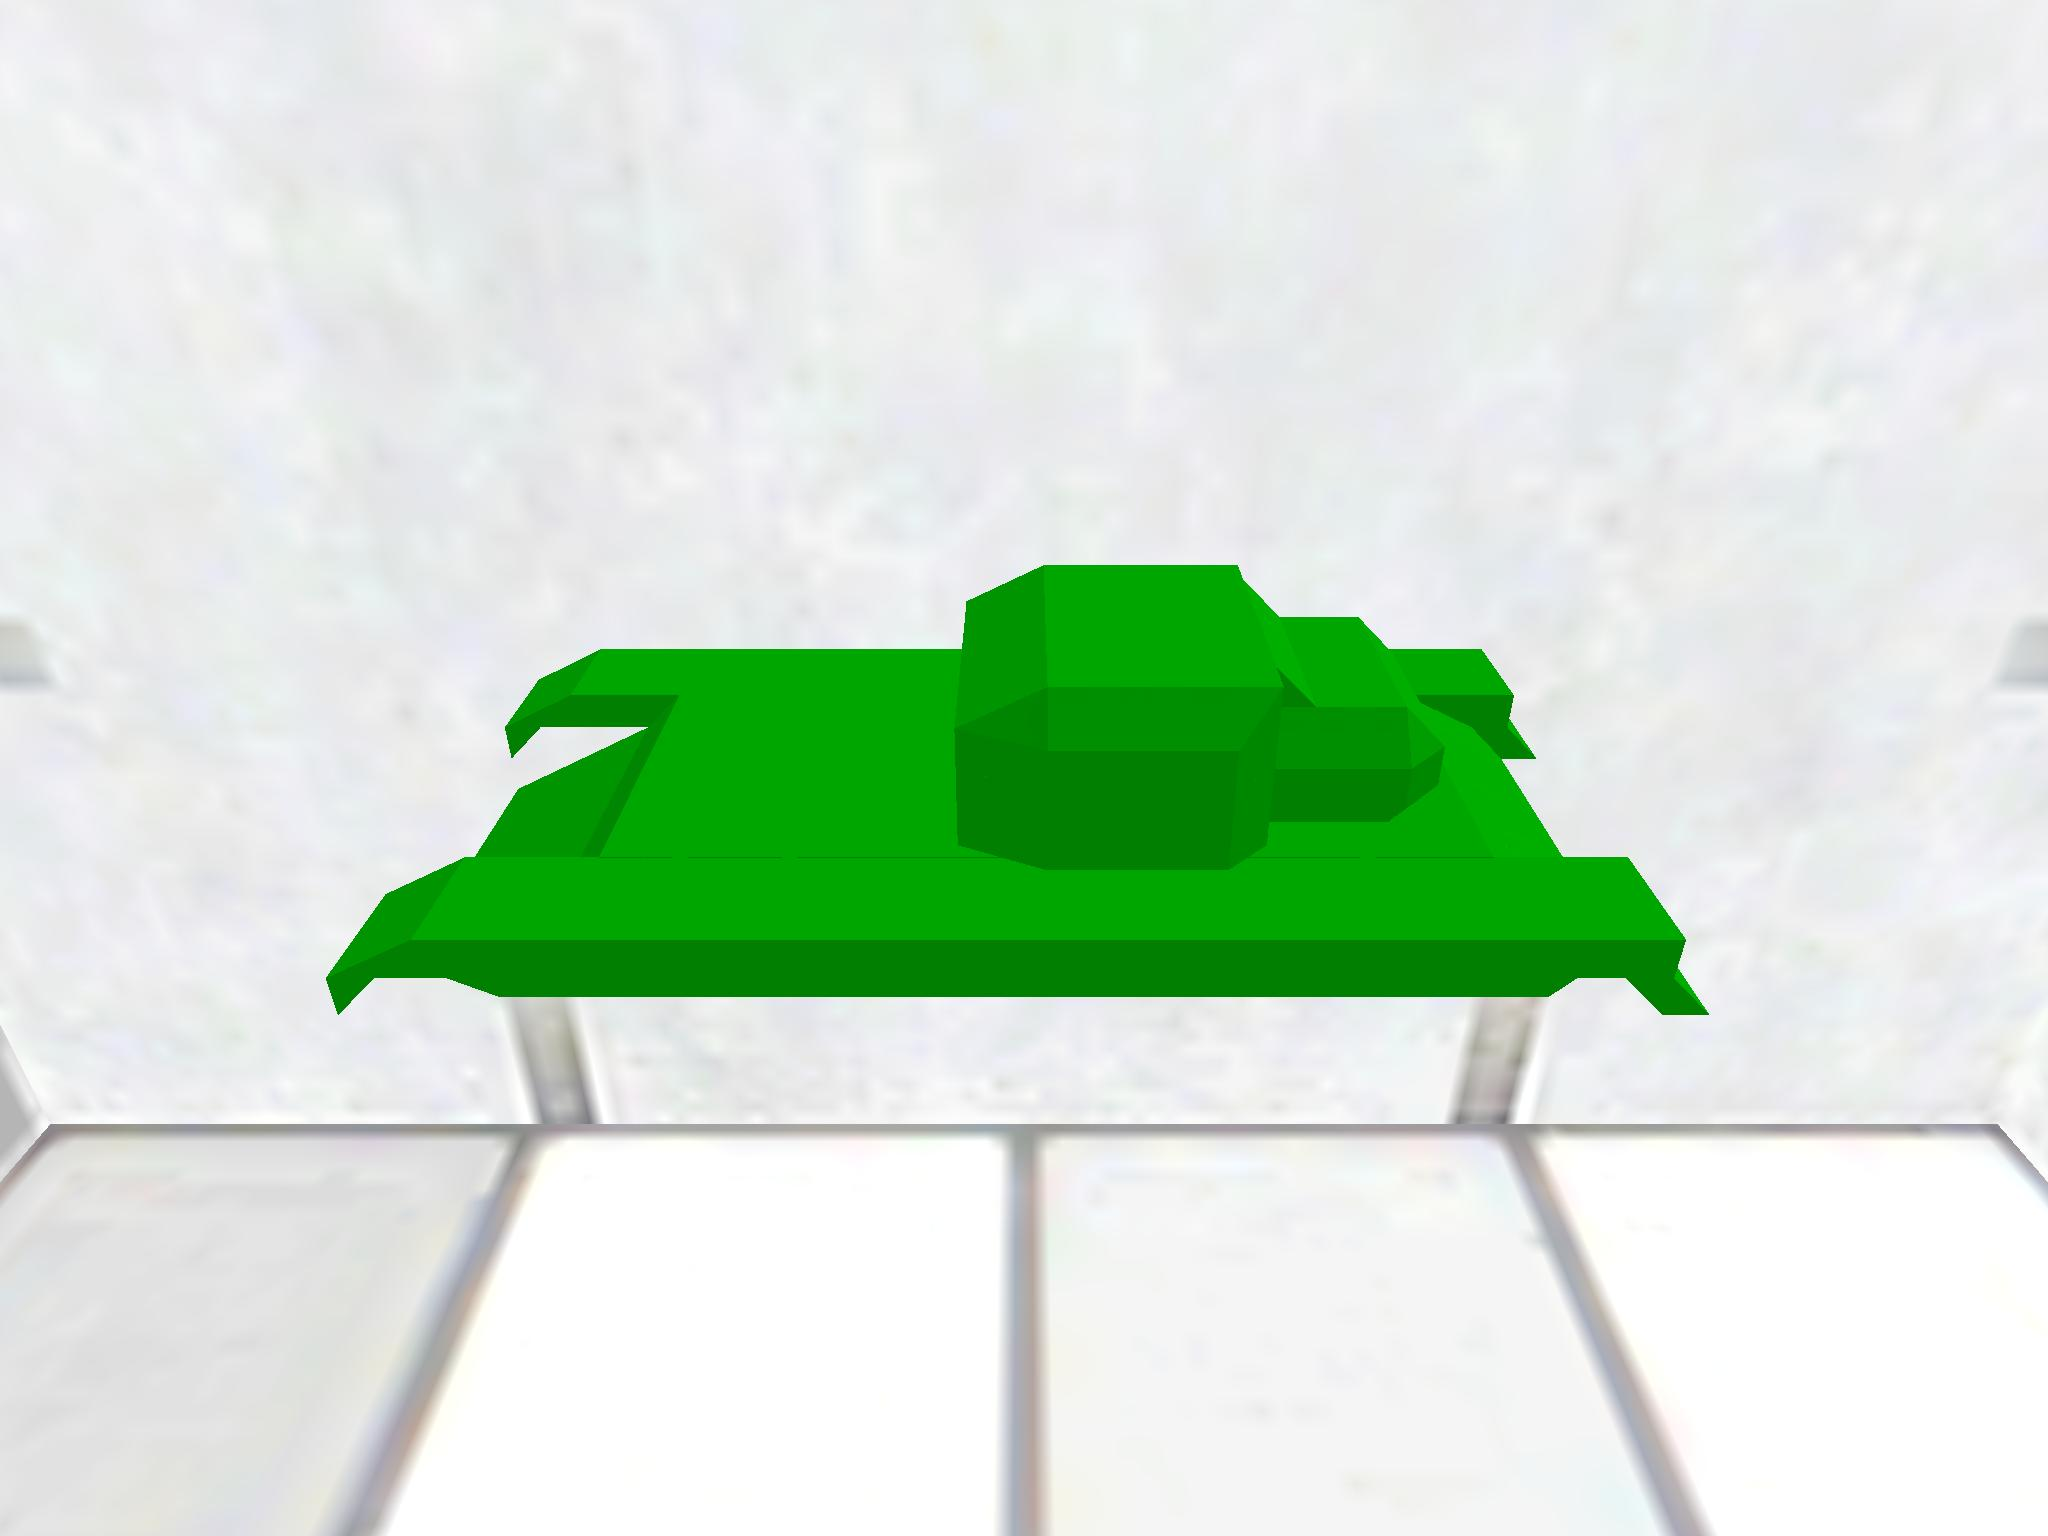 Kt-26